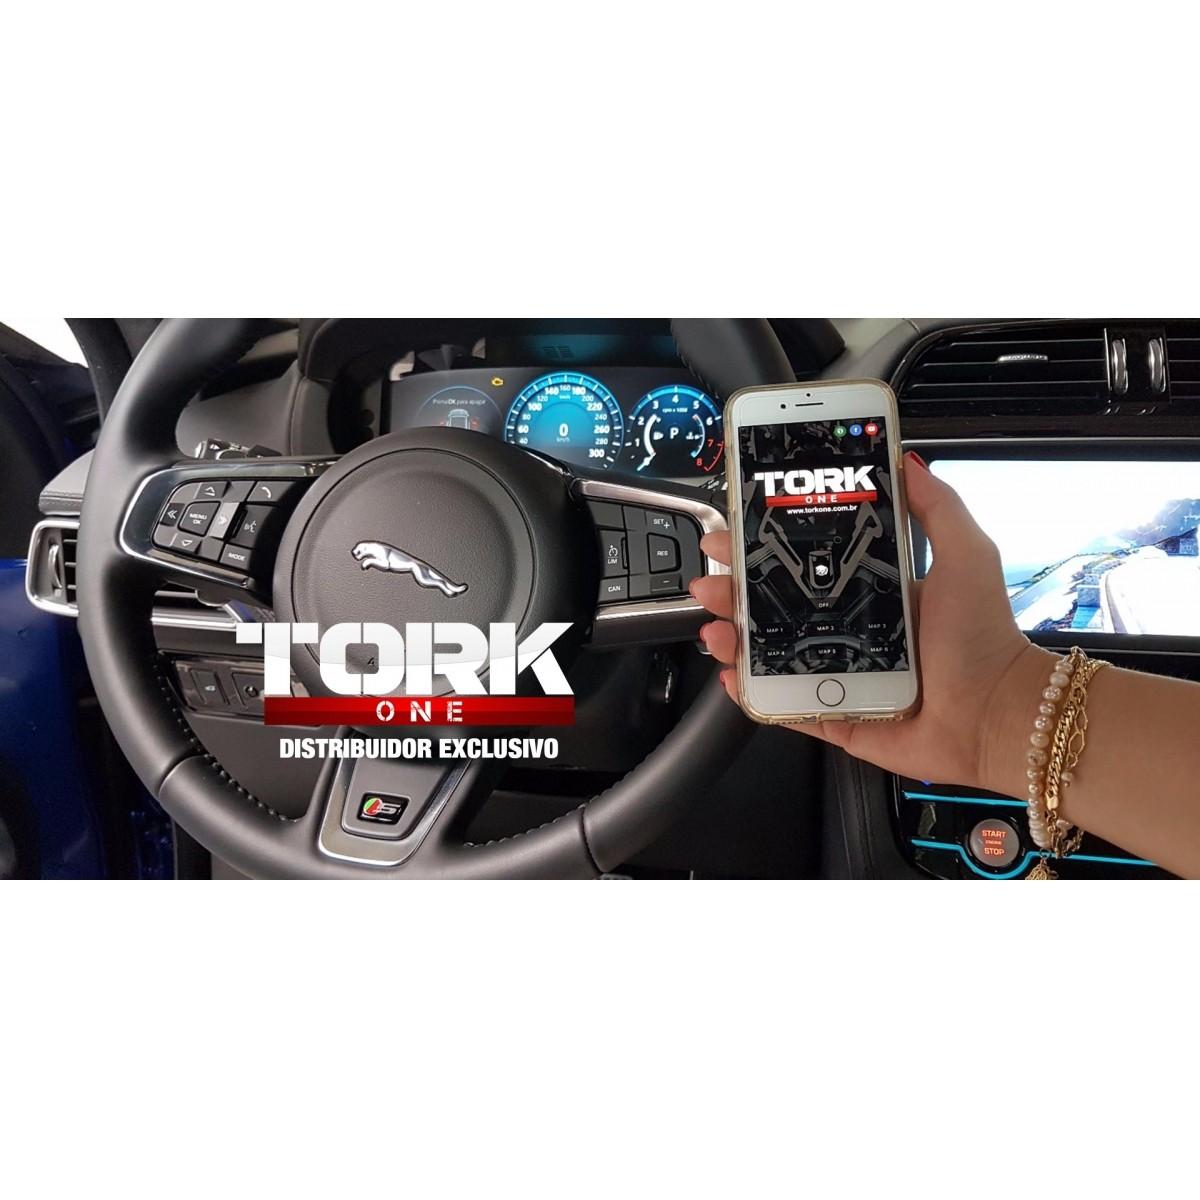 Gás Pedal - Nissan - Tork One c/s Bluetooth